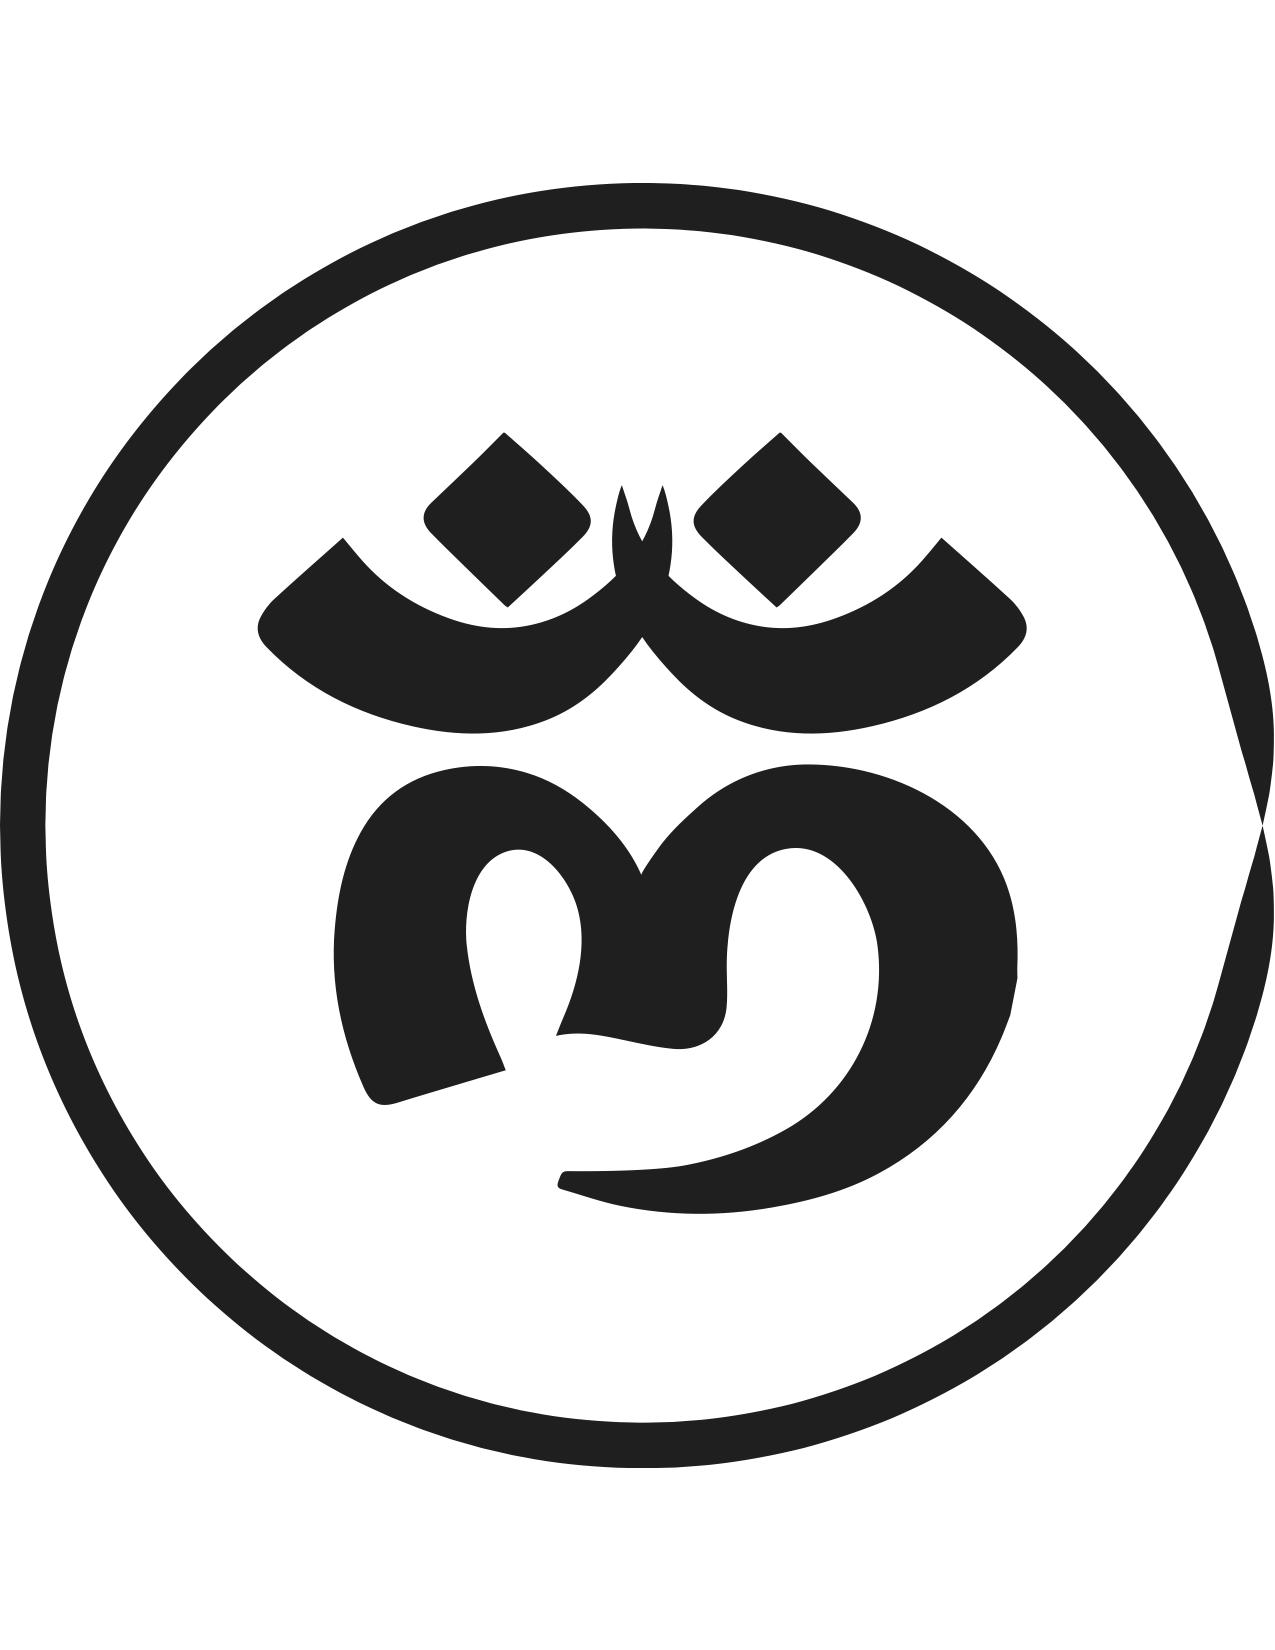 Pin By Zenposts On Zen Symbols Pinterest Yoga Symbols And Symbols